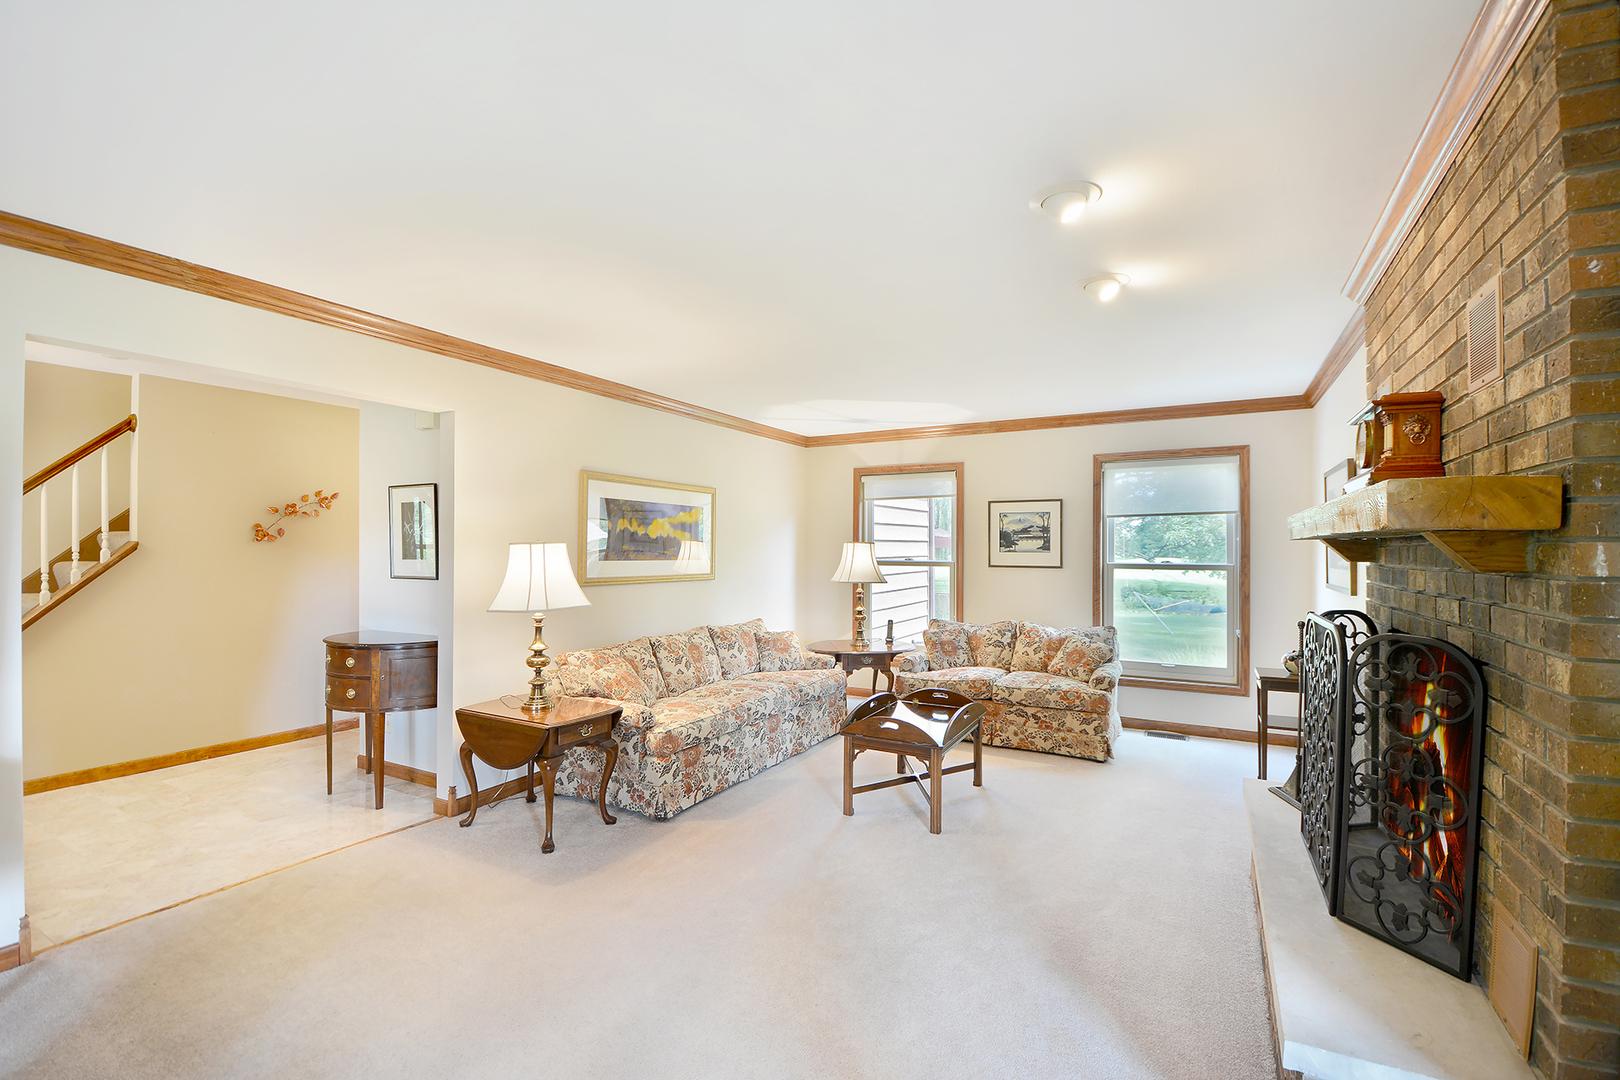 37 Sequoia Road, Hawthorn Woods, IL, 60047 | john greene Realtor